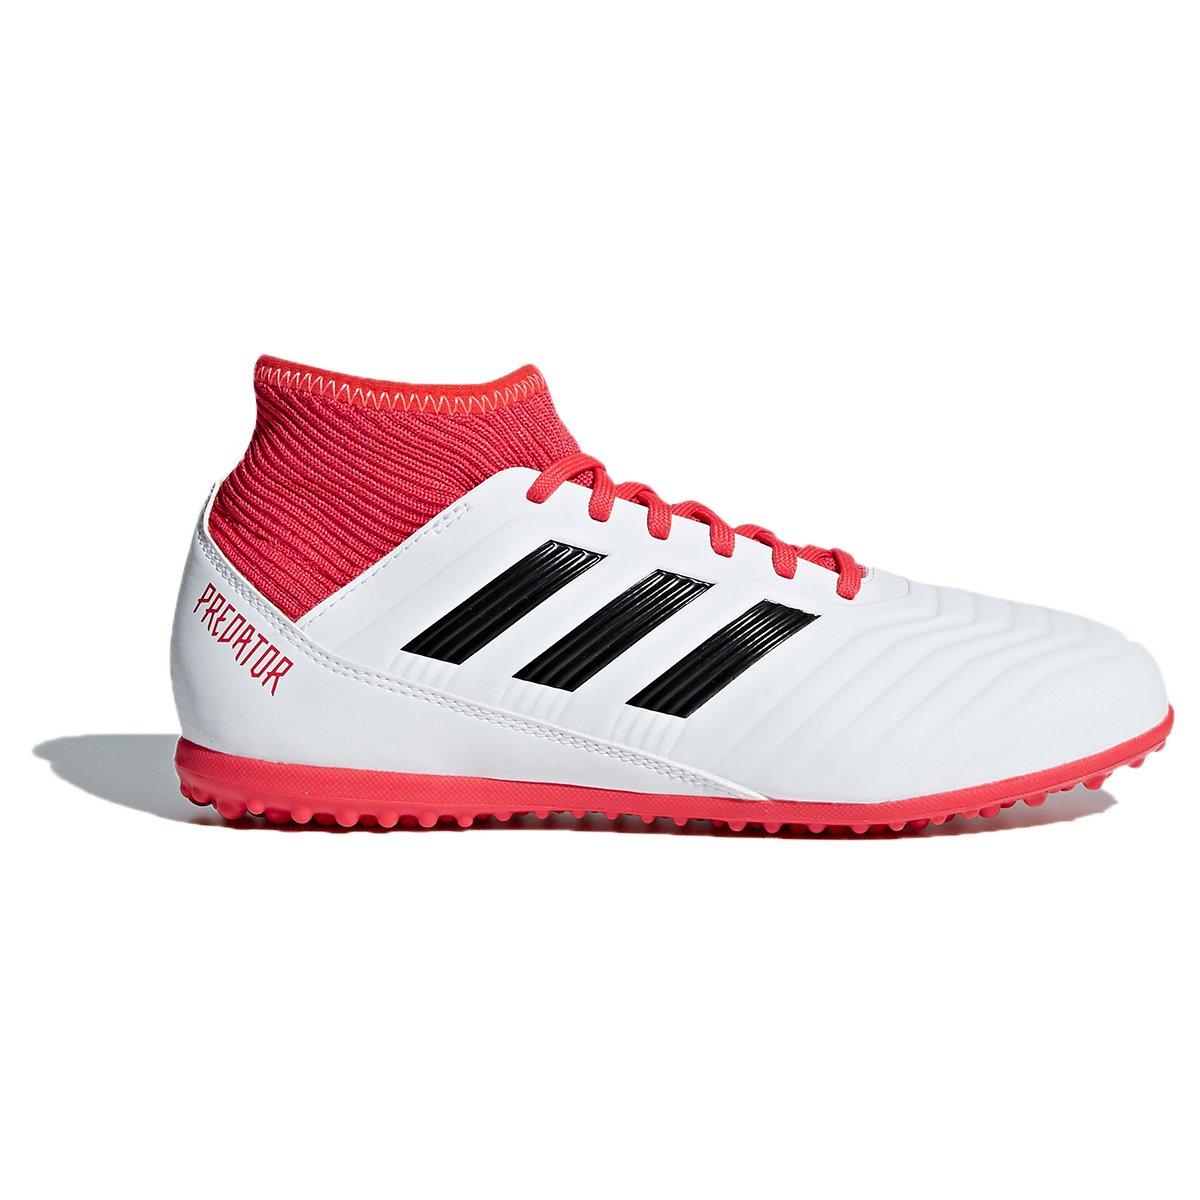 ac1d5aa66b Chuteira Society Infantil Adidas Predator 18.3 TF